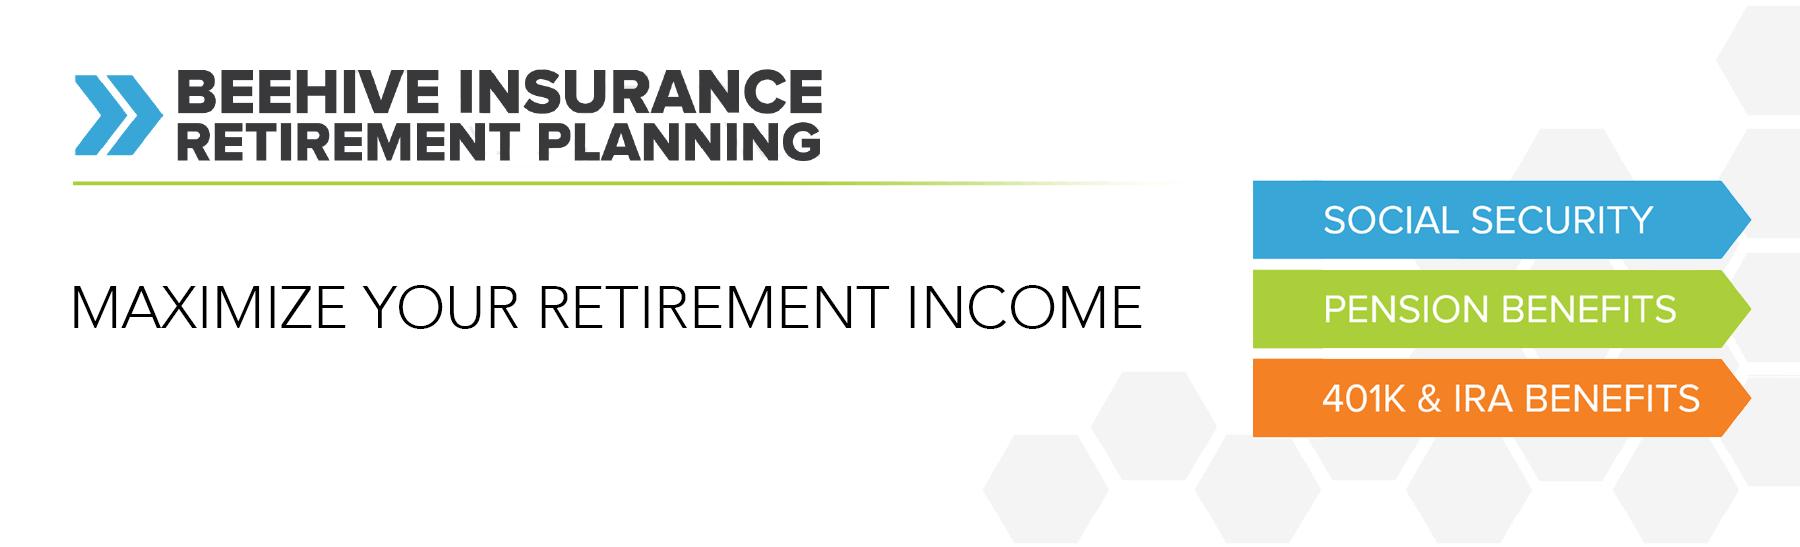 Maximize your retirement income